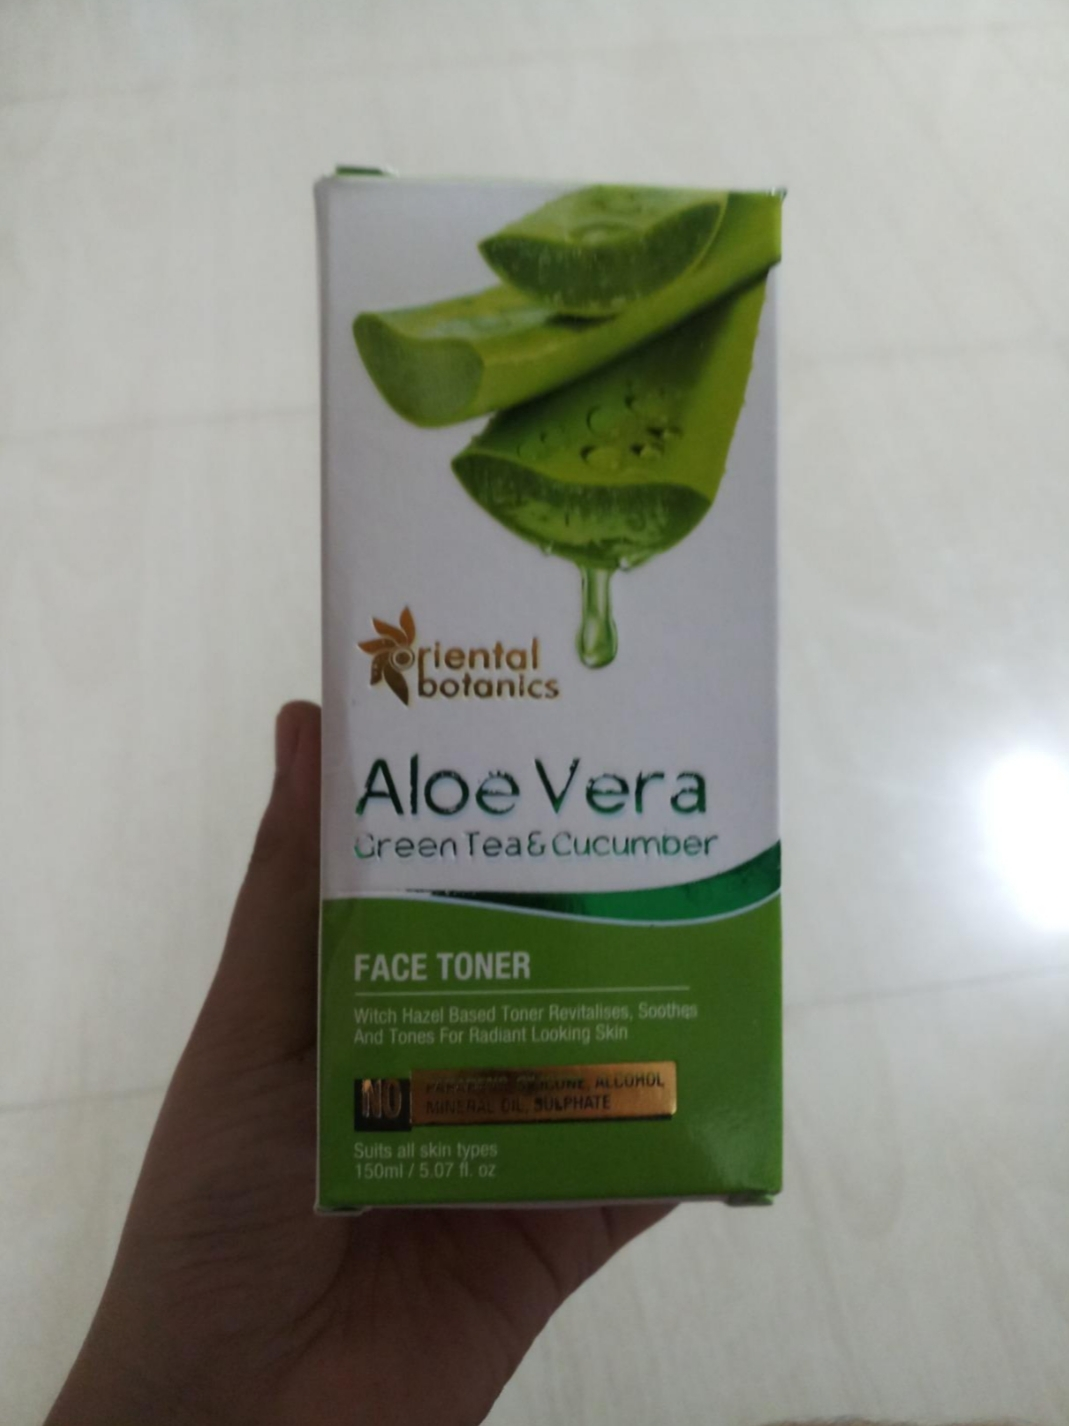 Oriental Botanics Aloe Vera, Green Tea & Cucumber Face Toner pic 2-Best Ever Toner-By ketki_lembhe